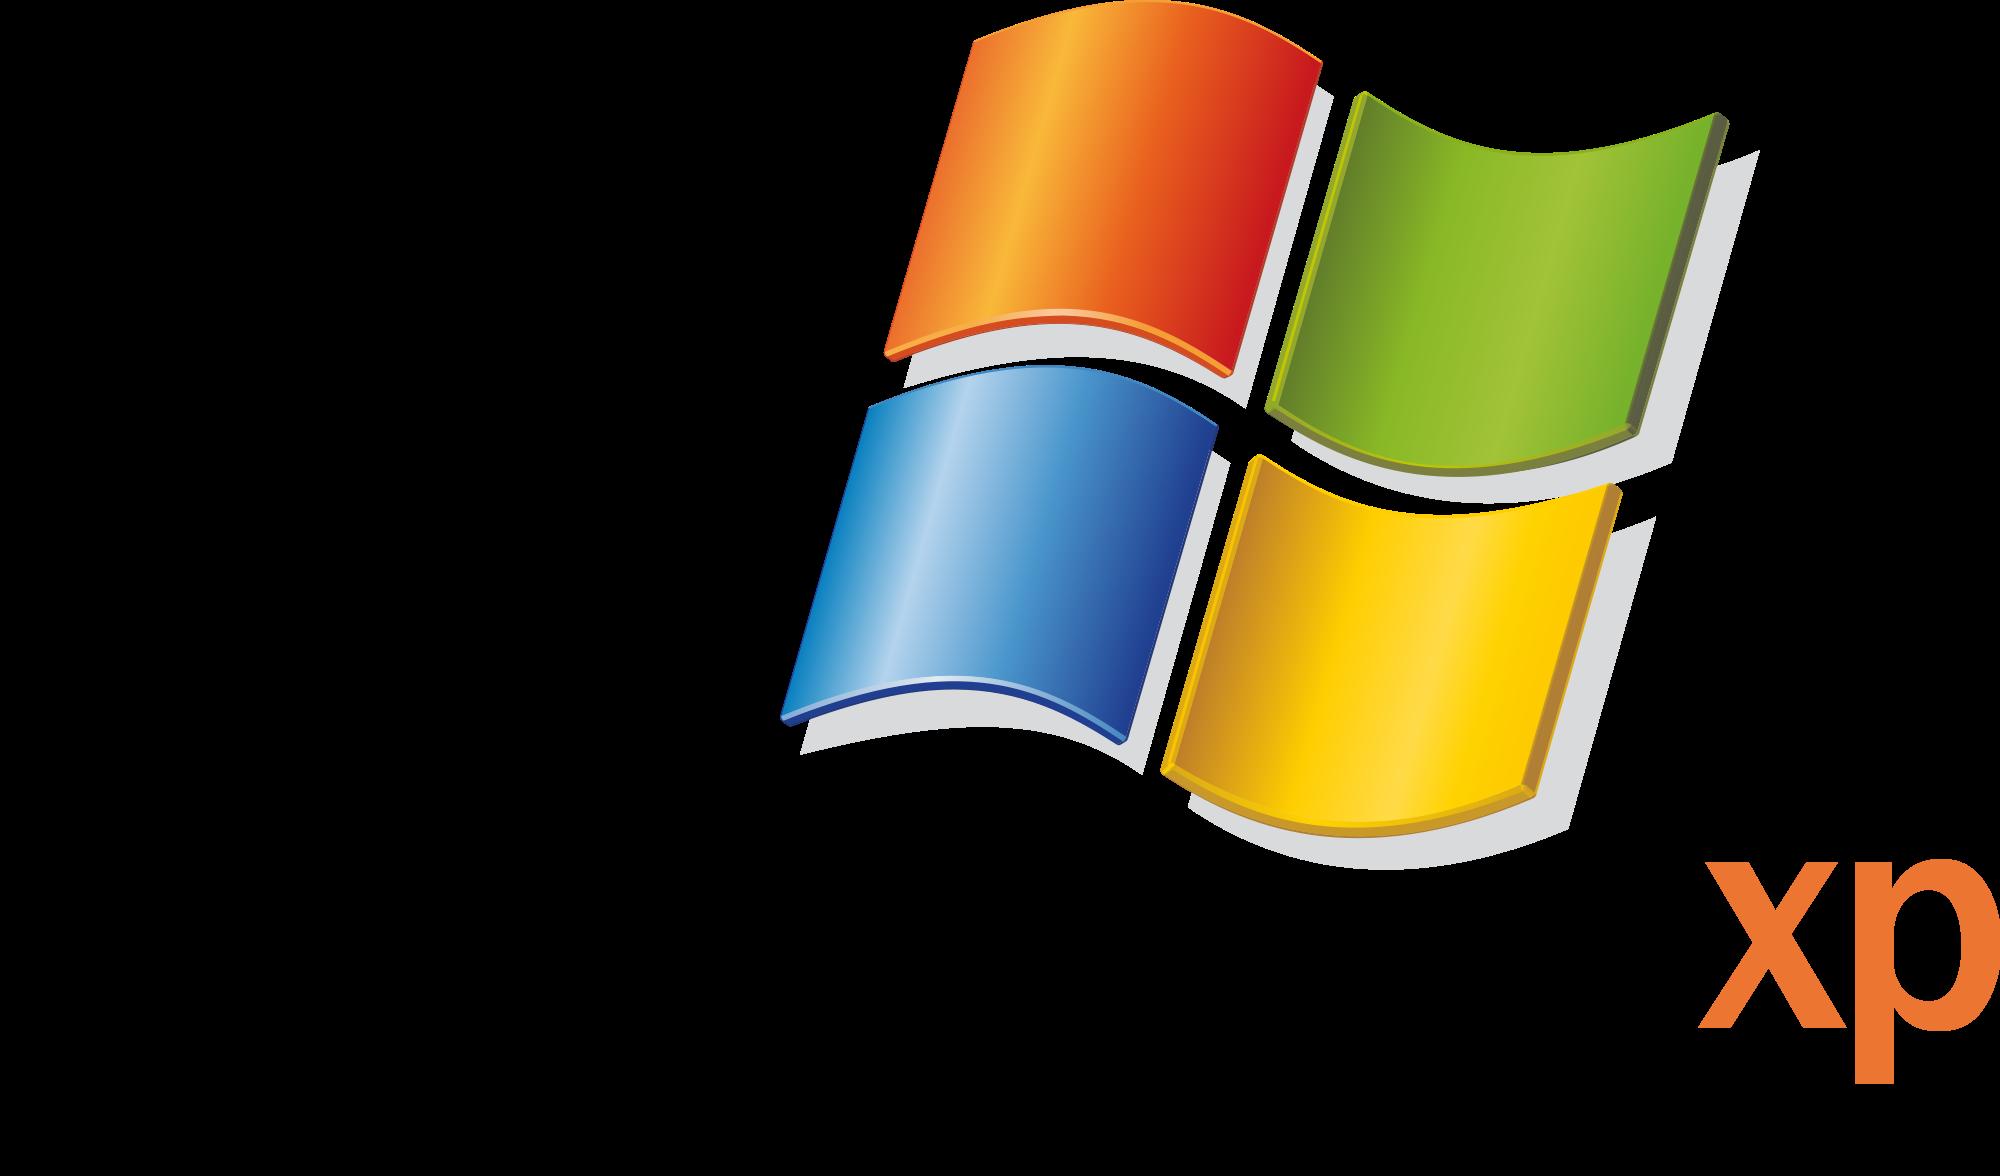 clipart transparent stock Microsoft transparent free on. 90s clipart windows 98